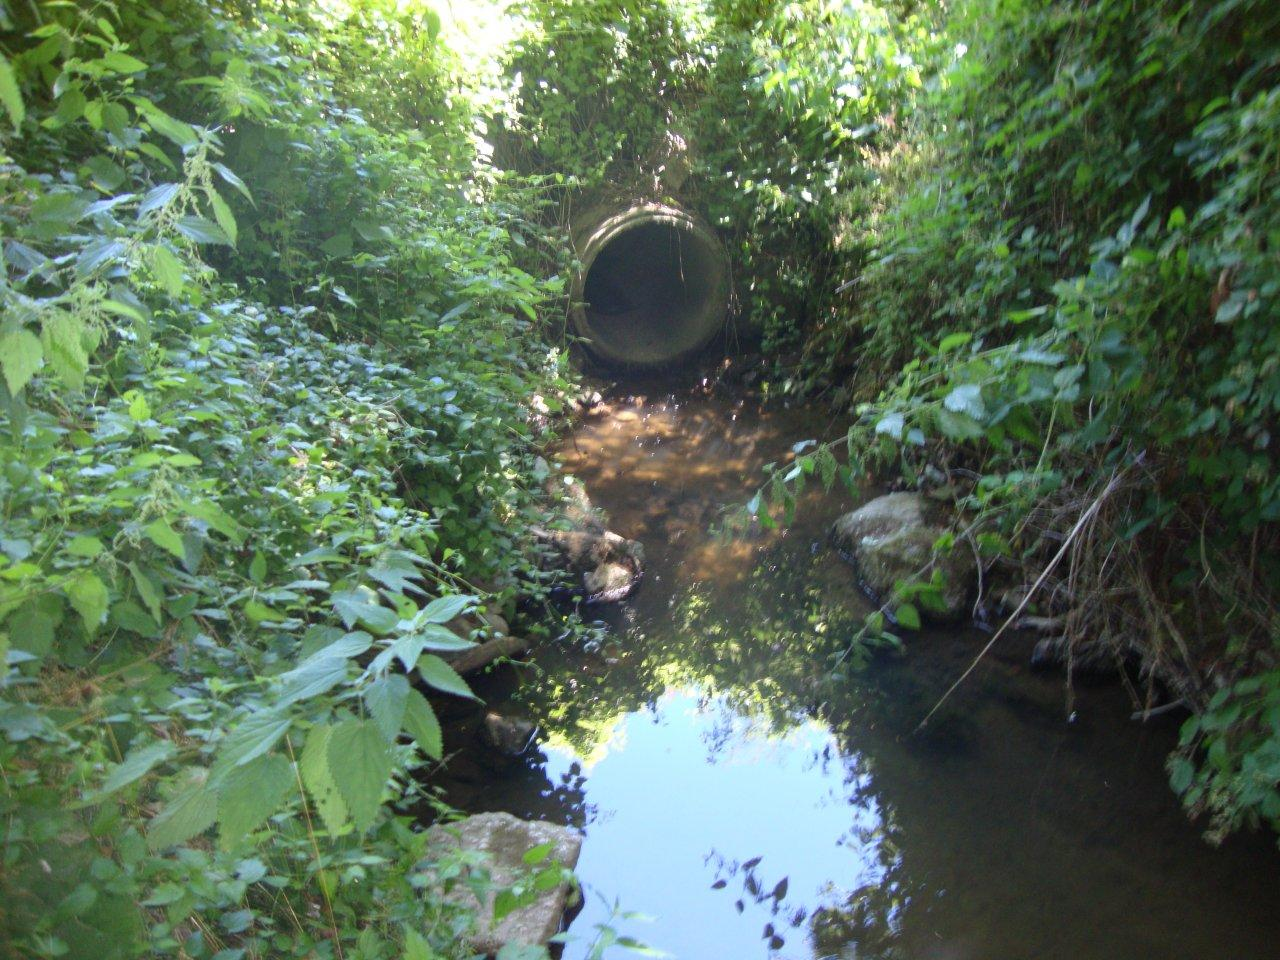 I liquami dei depuratori cosparsi sul terrenoSequestrati 4 impianti nel Cosentino, 2 indagati